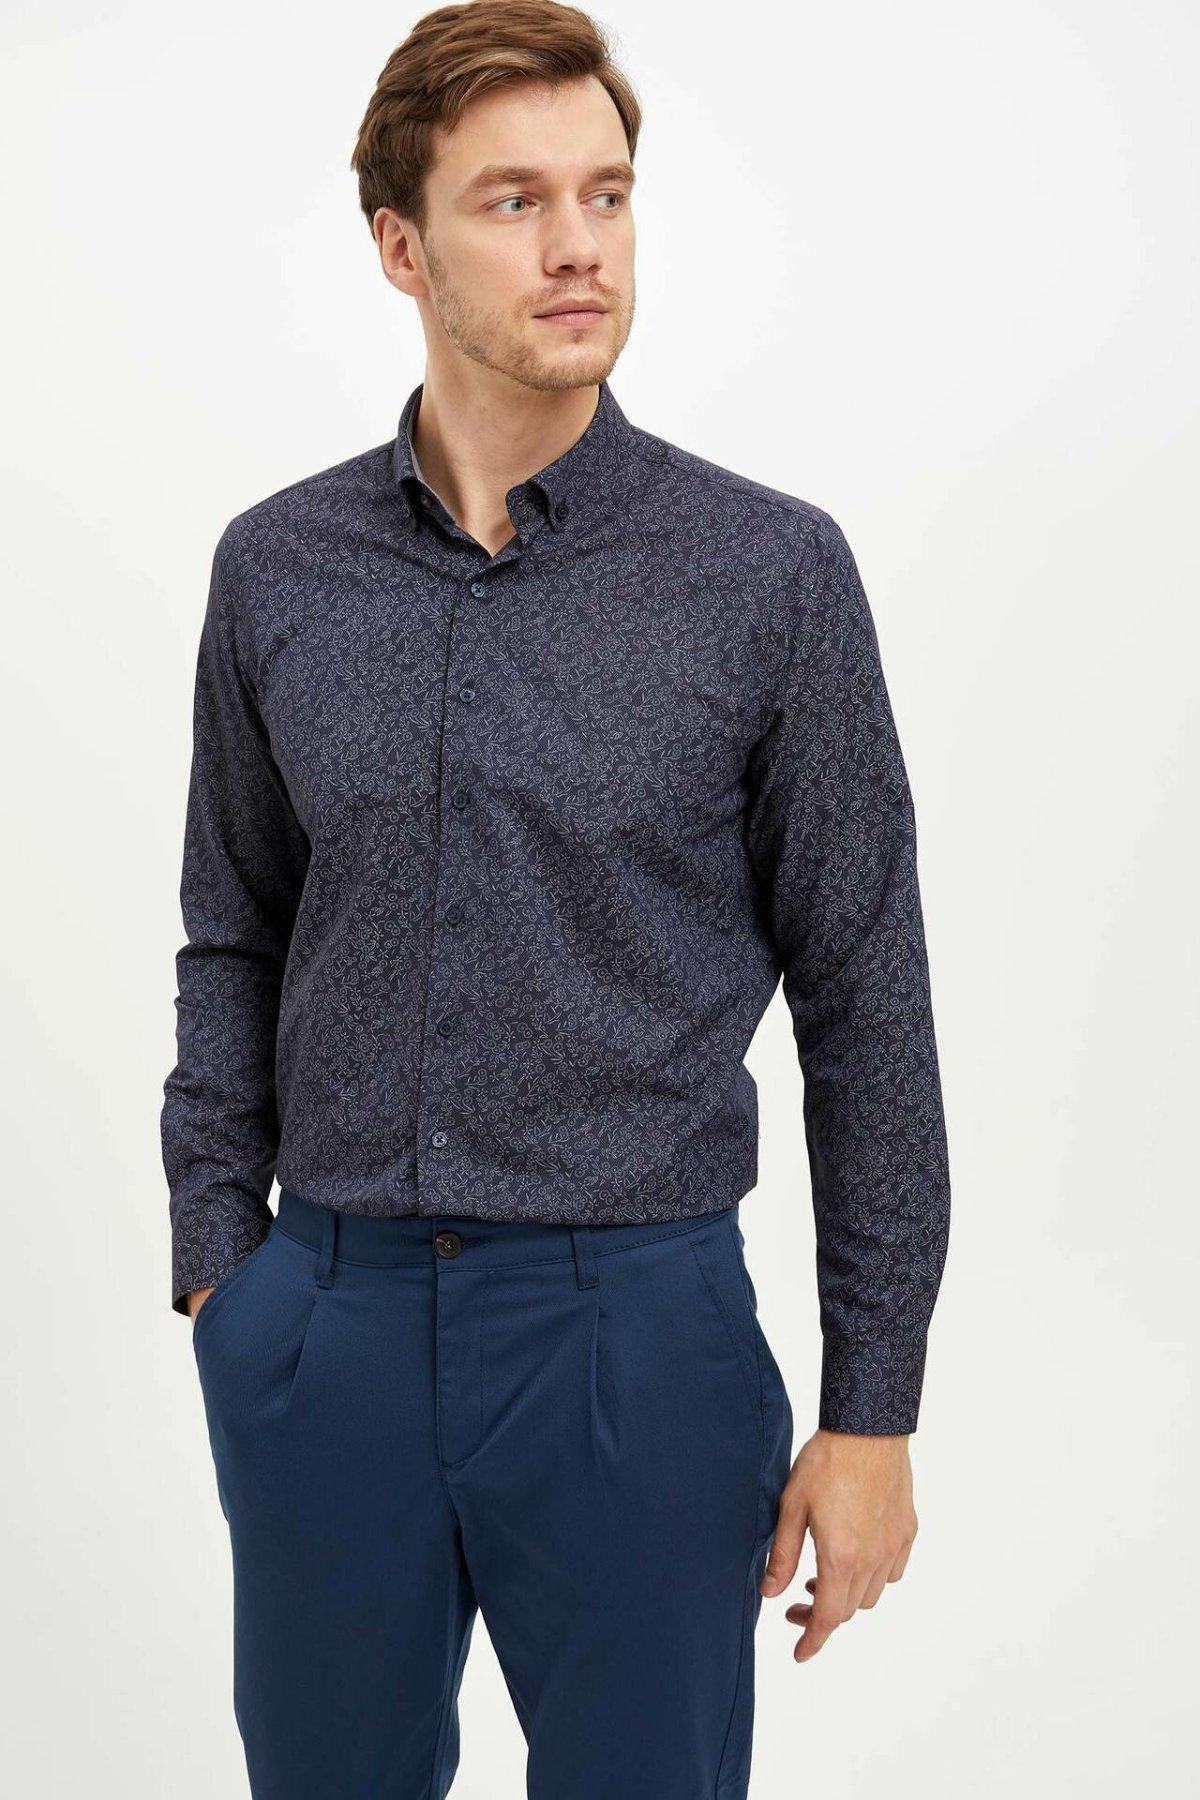 DeFacto Men Simple Shirts Long Sleeve Solid Shirts Mens Casual Lapel Collar Casual Shirt New - L5375AZ19AU-L5375AZ19AU